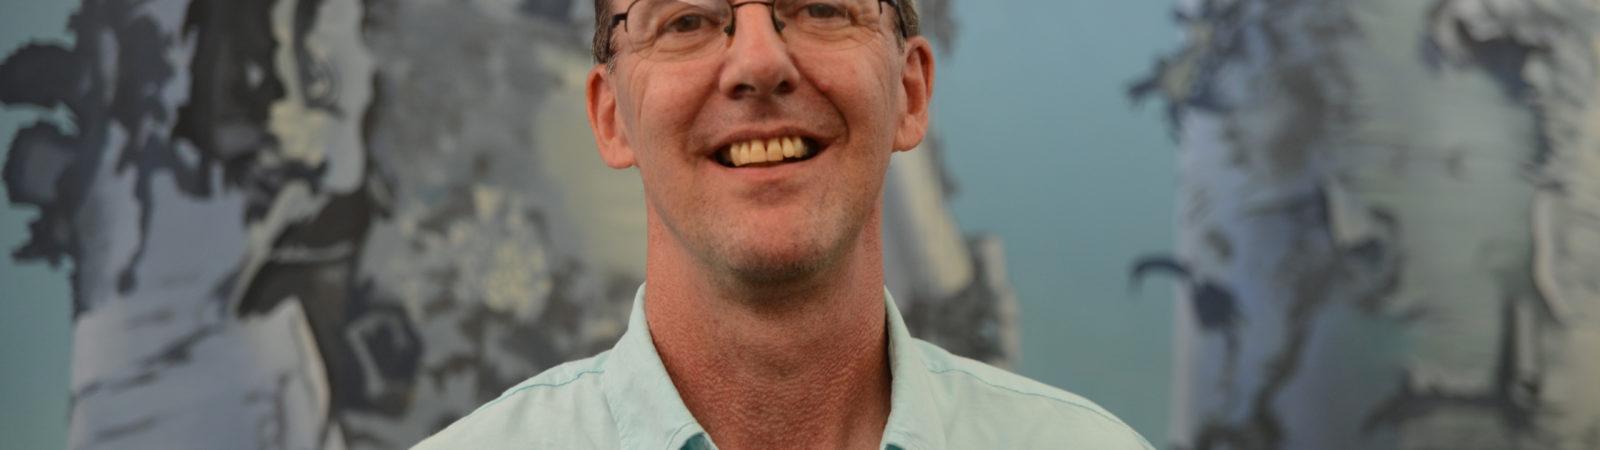 Northland College alum Stuart Barnes Jamieson